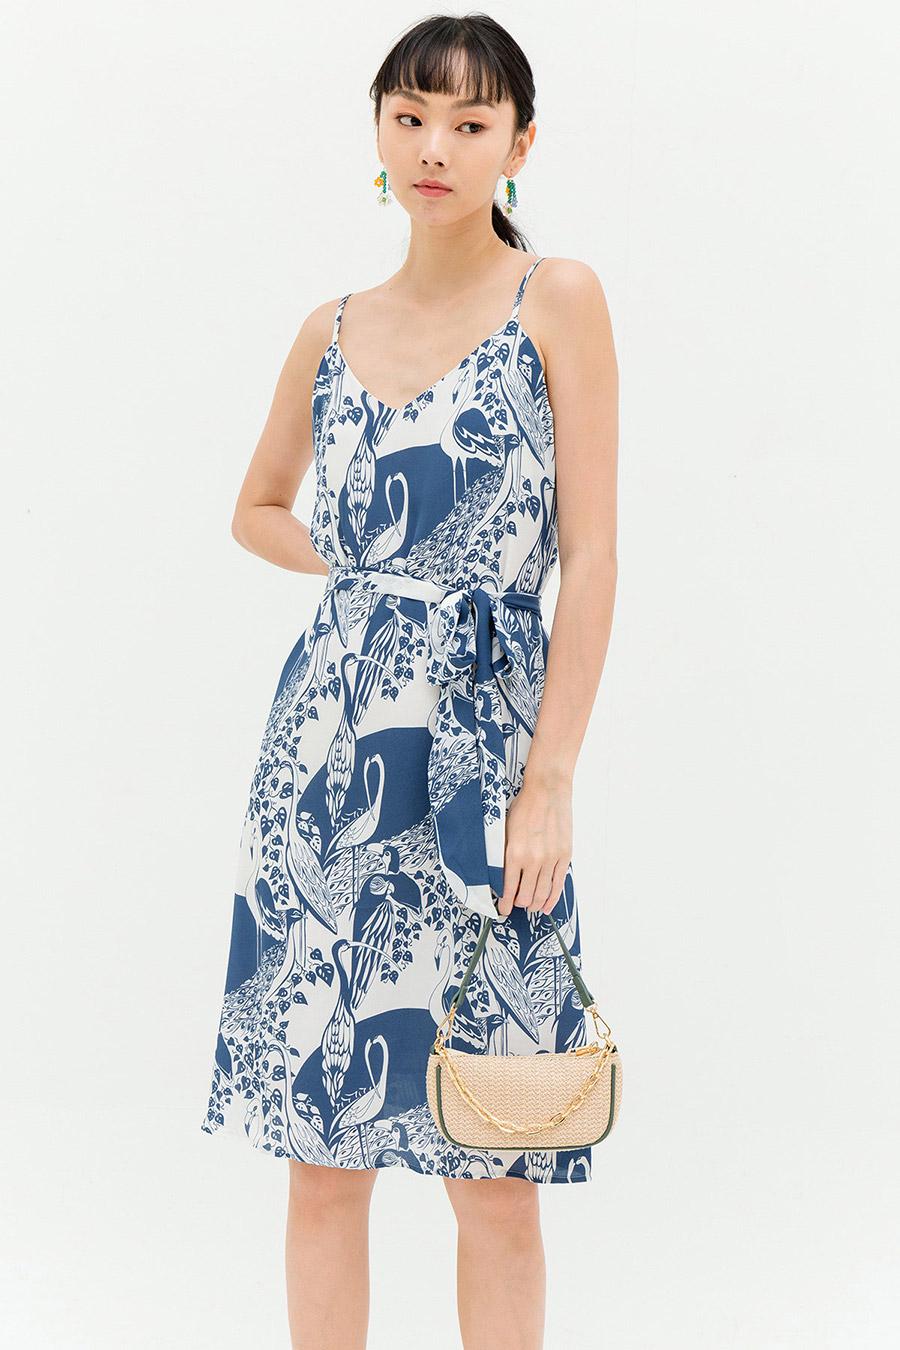 HALLE DRESS - BLUEBIRD